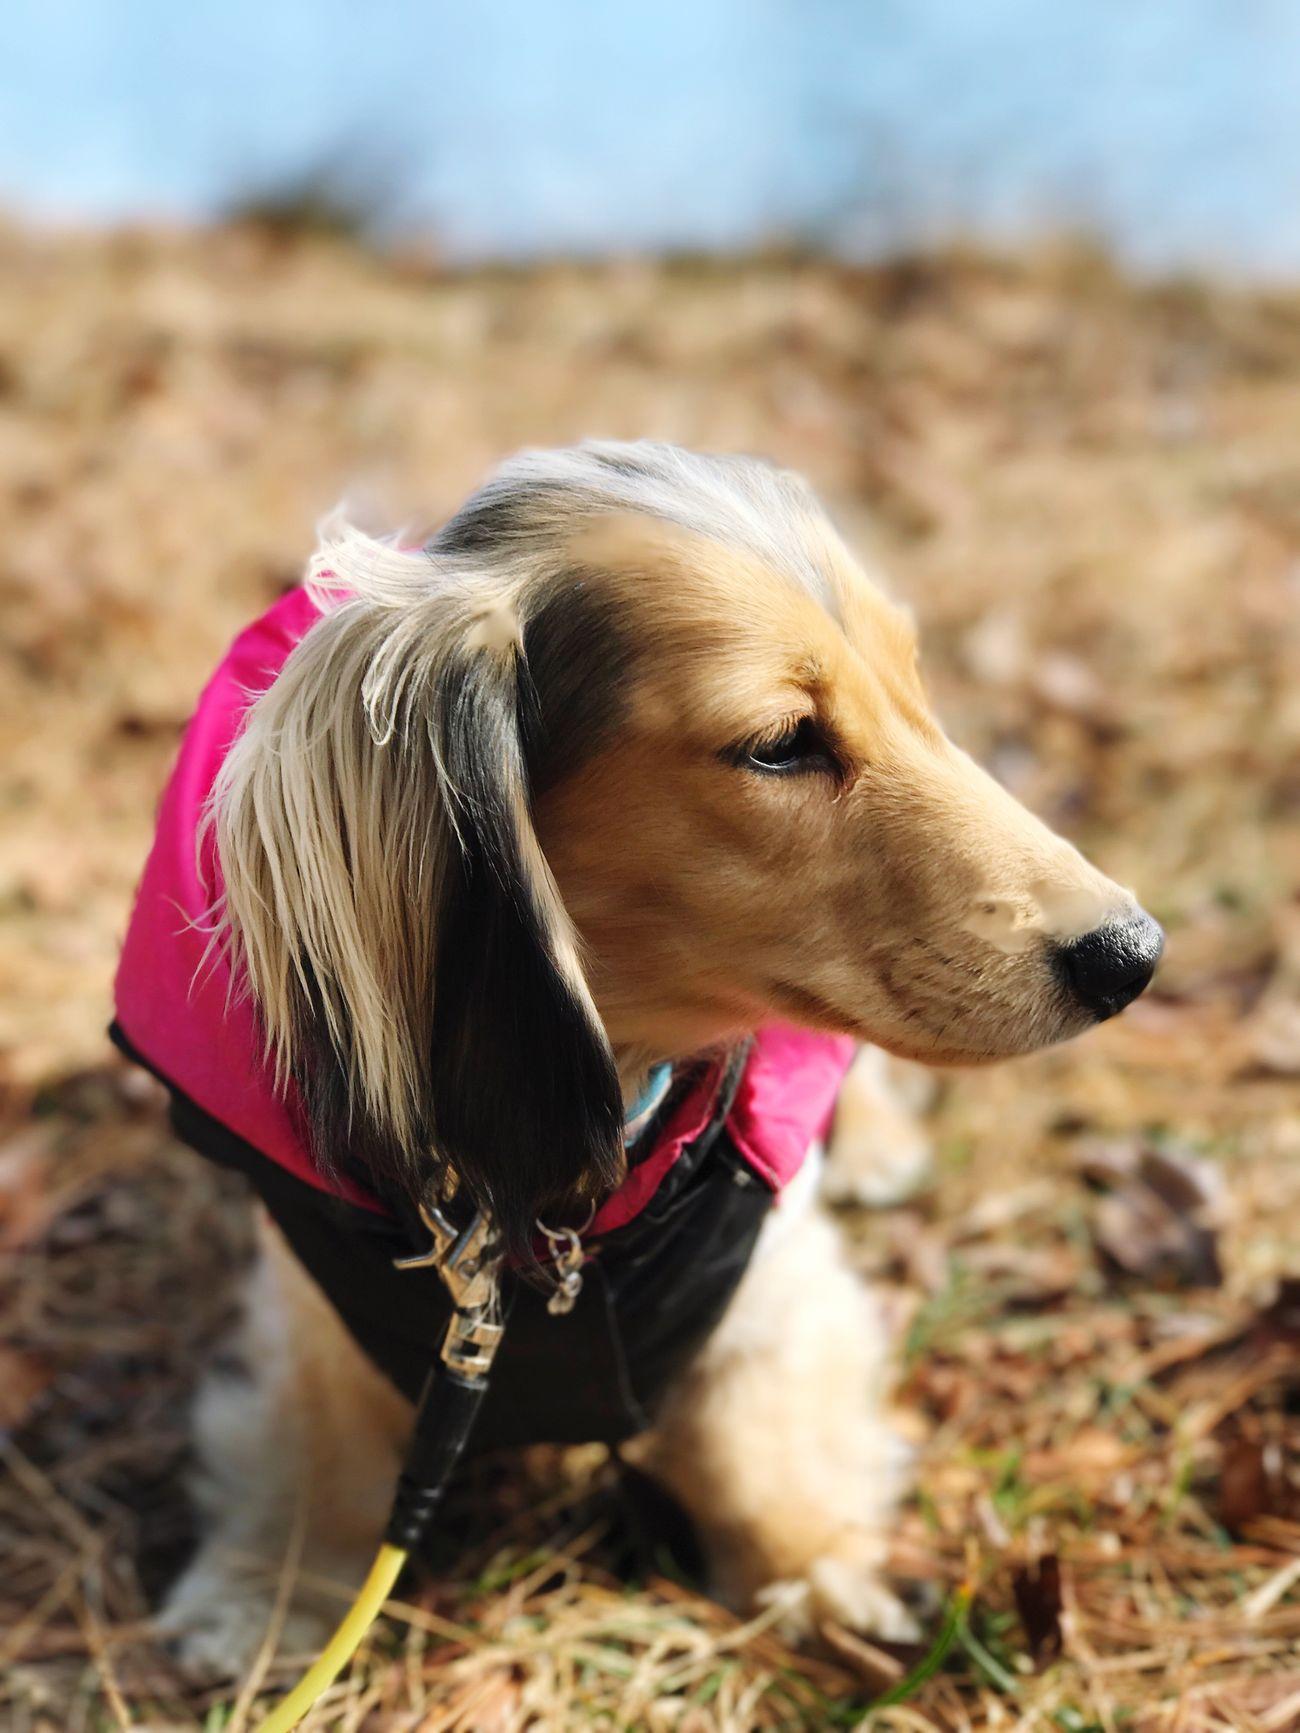 Close-up Minituredachshund Pets Outdoors IPhone7Plus 敷島公園 Wintertime